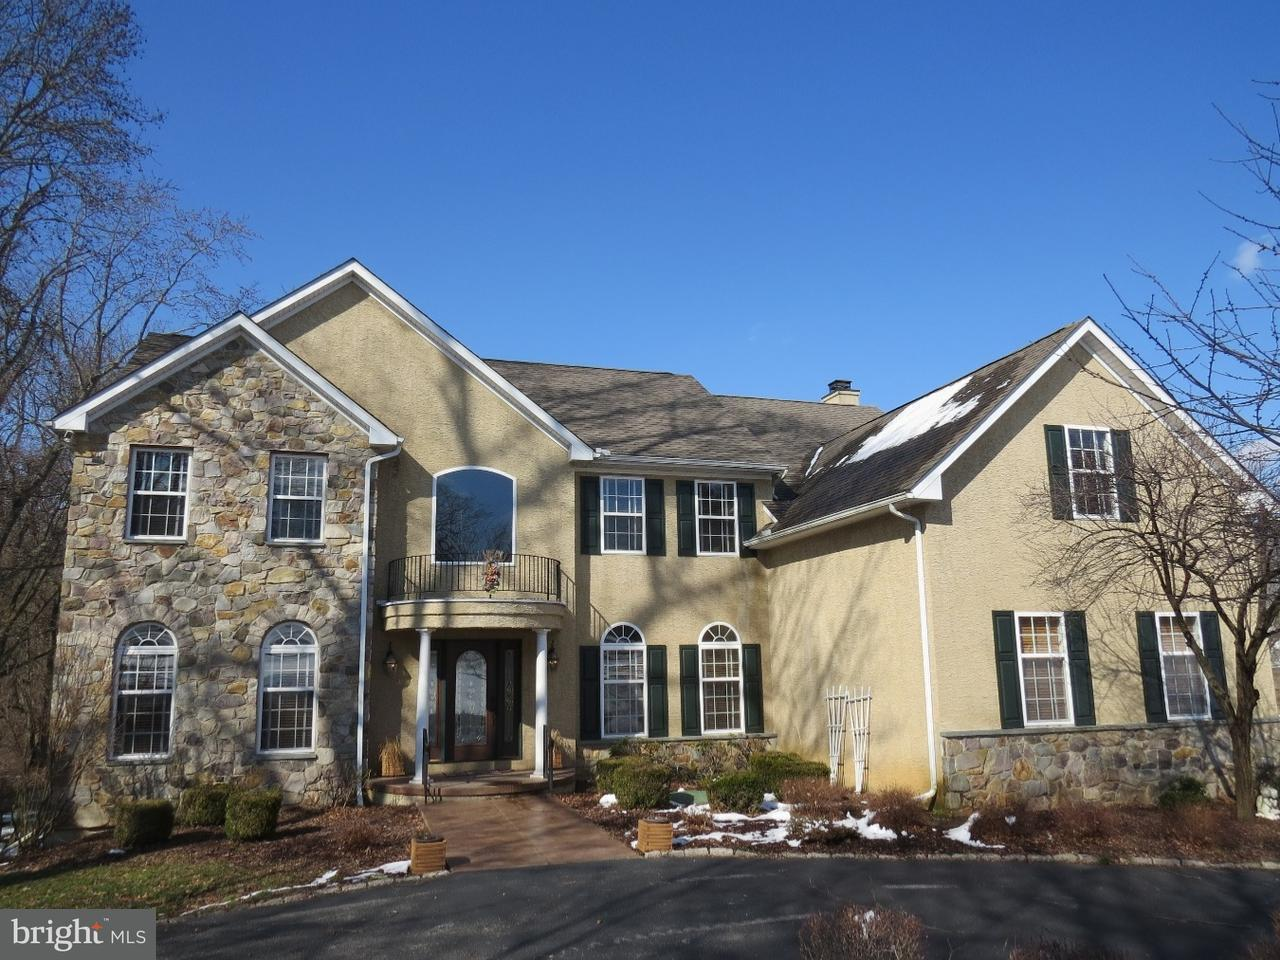 Single Family Home for Sale at 826 BENGE Road Hockessin, Delaware 19707 United States